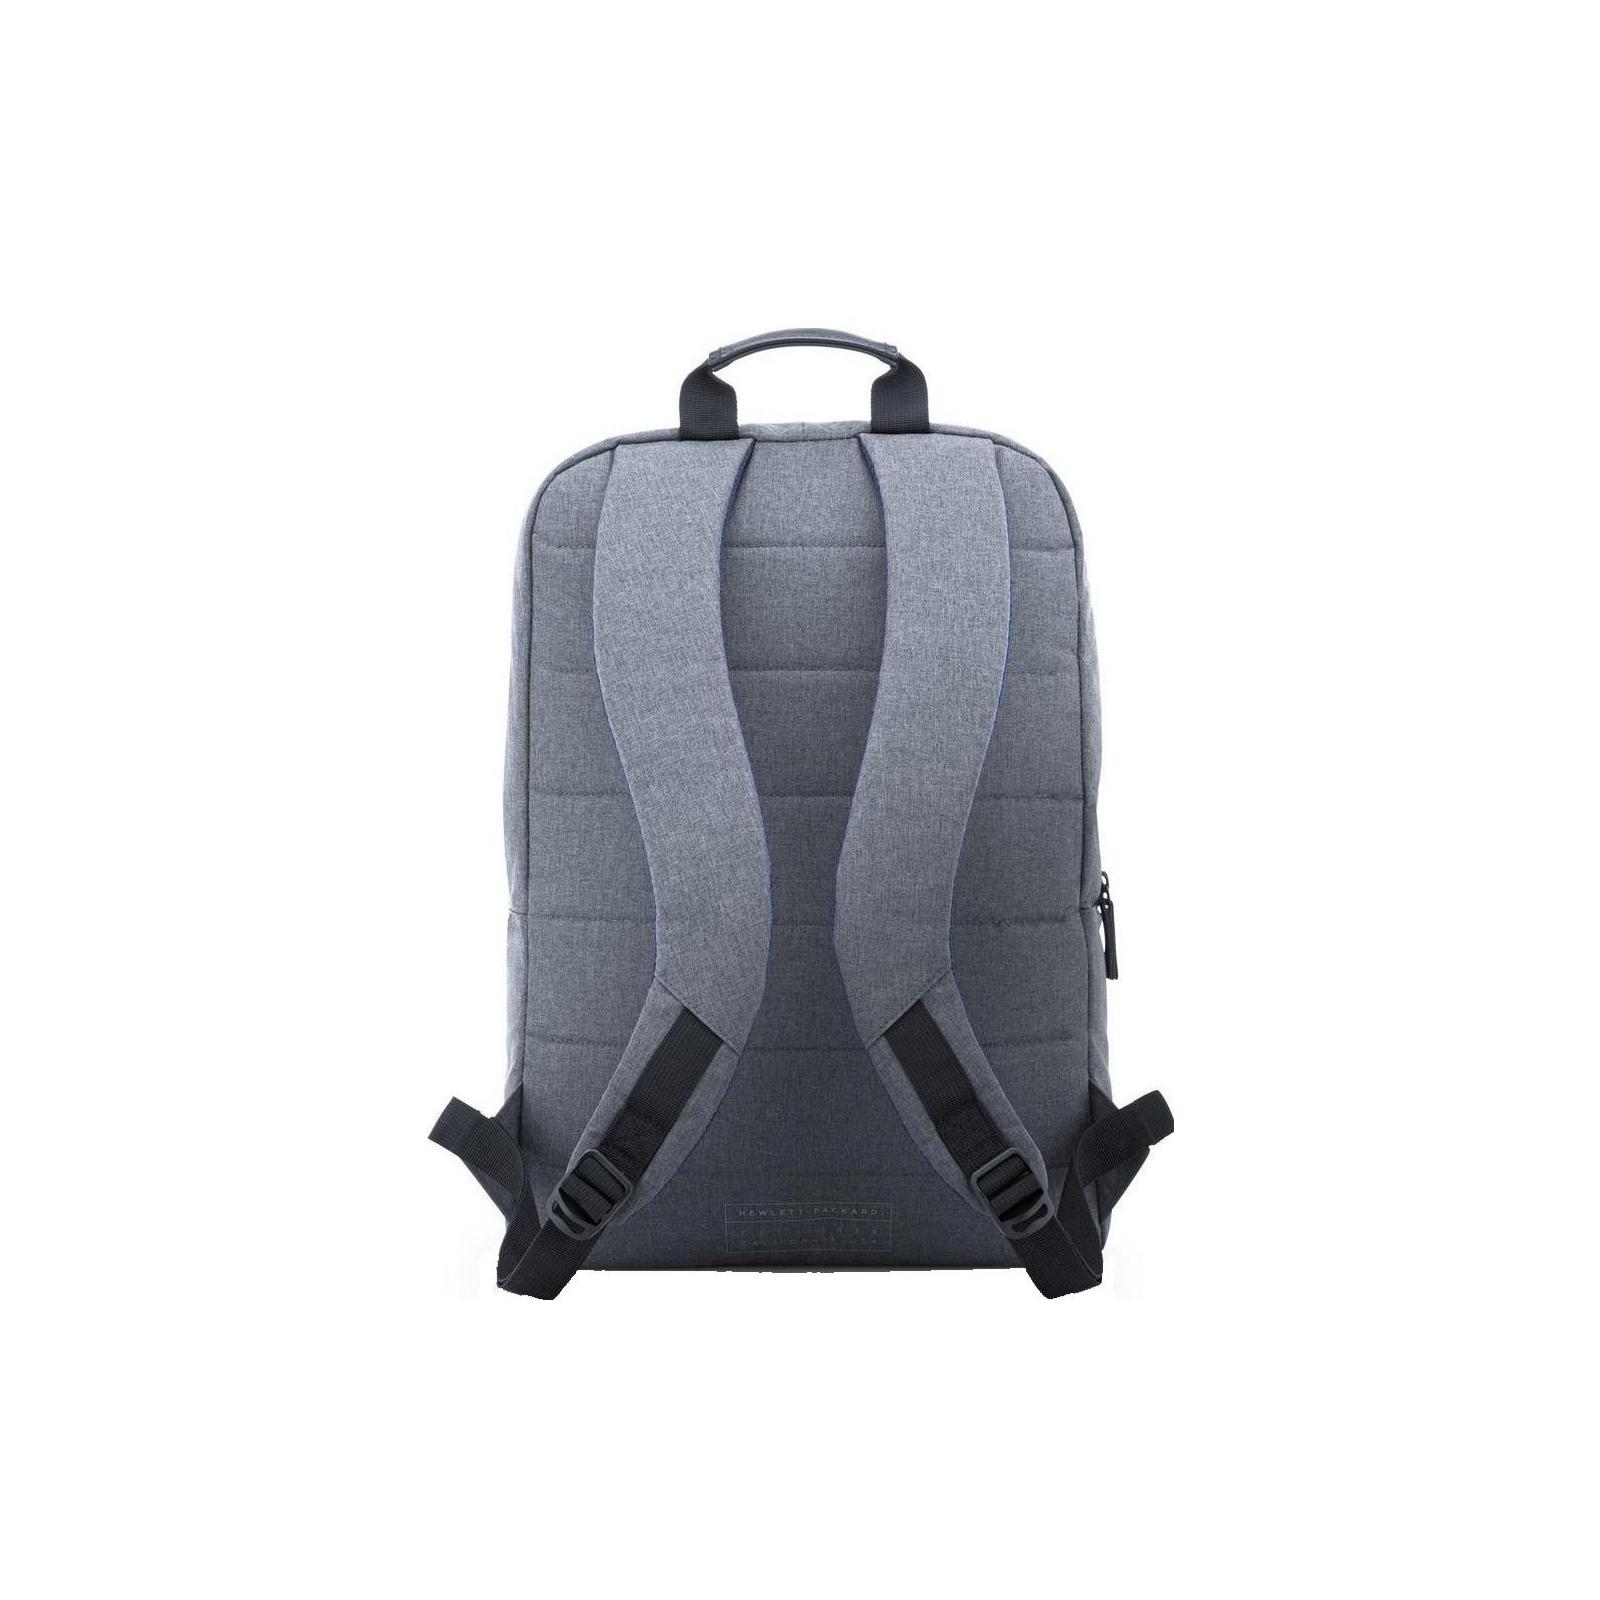 "Рюкзак для ноутбука HP 15.6"" Value Grey (K0B39AA) изображение 3"